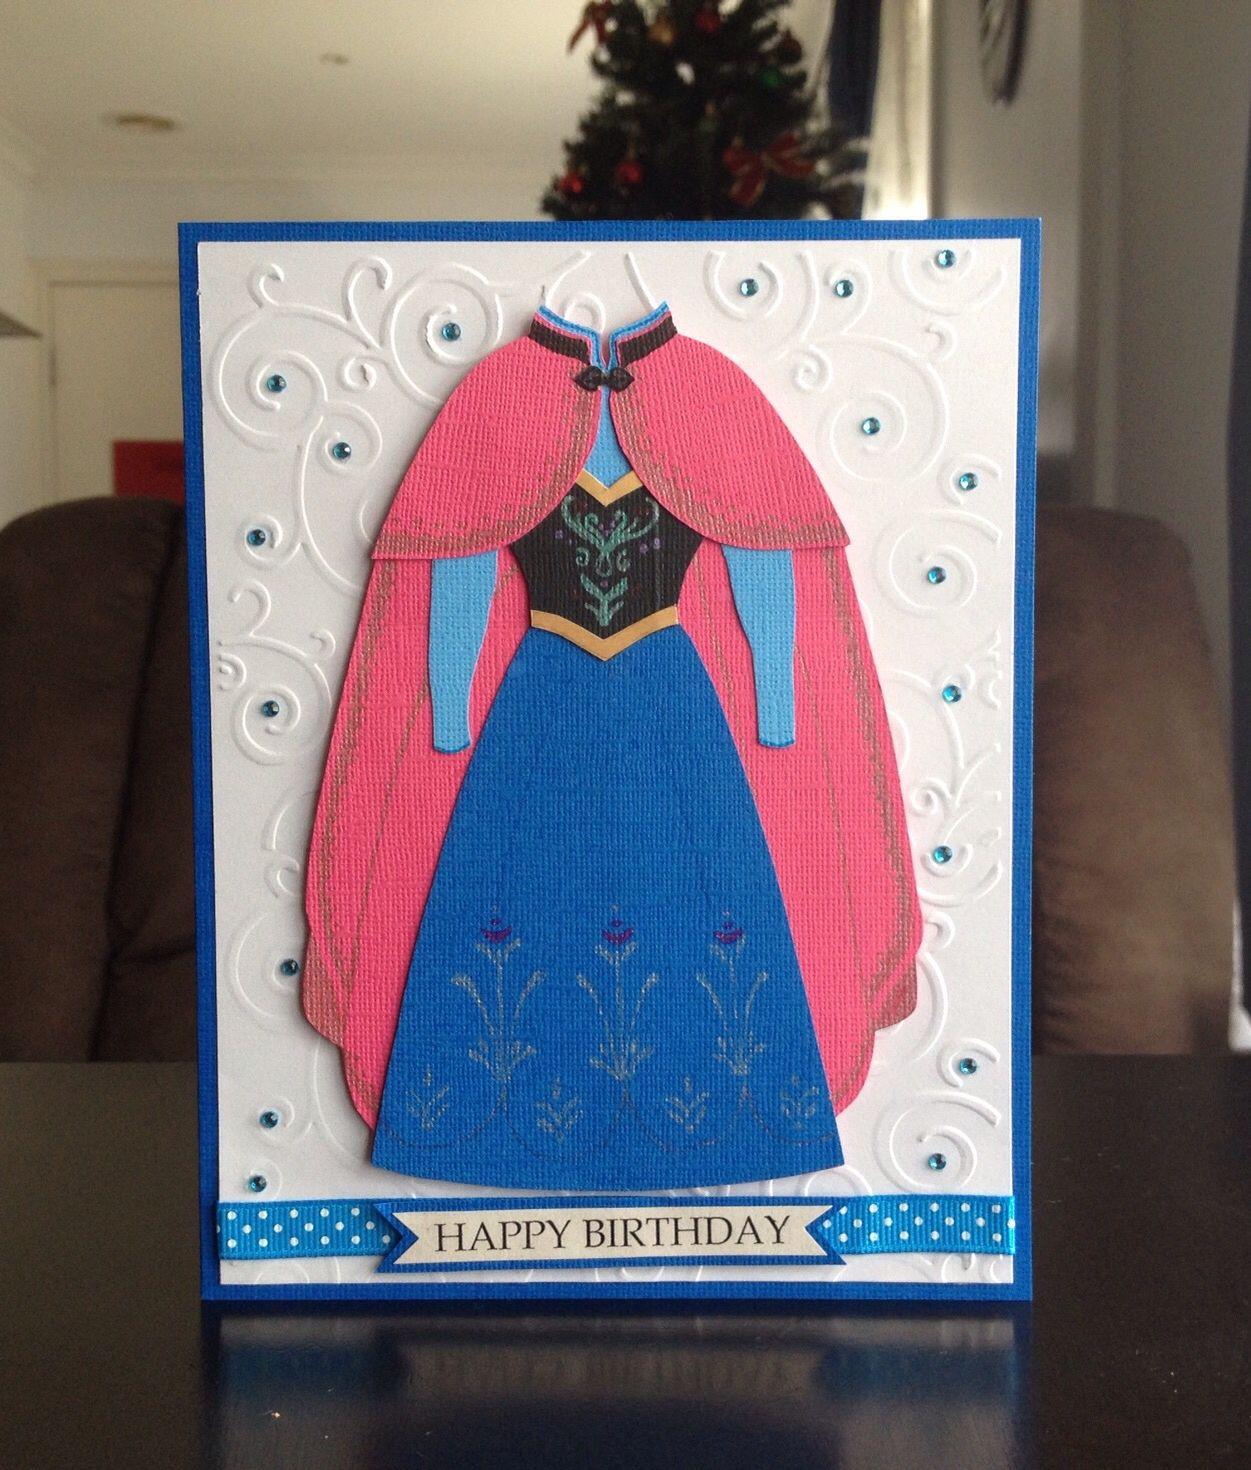 Frozen Theme Birthday Card Princess Anna by Graciekofoed – Themed Birthday Cards